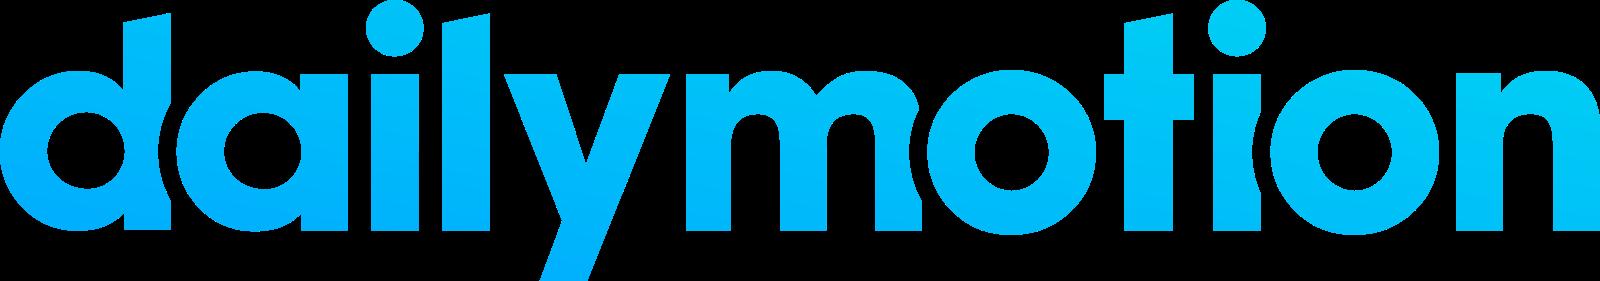 dailymotion-logo-4